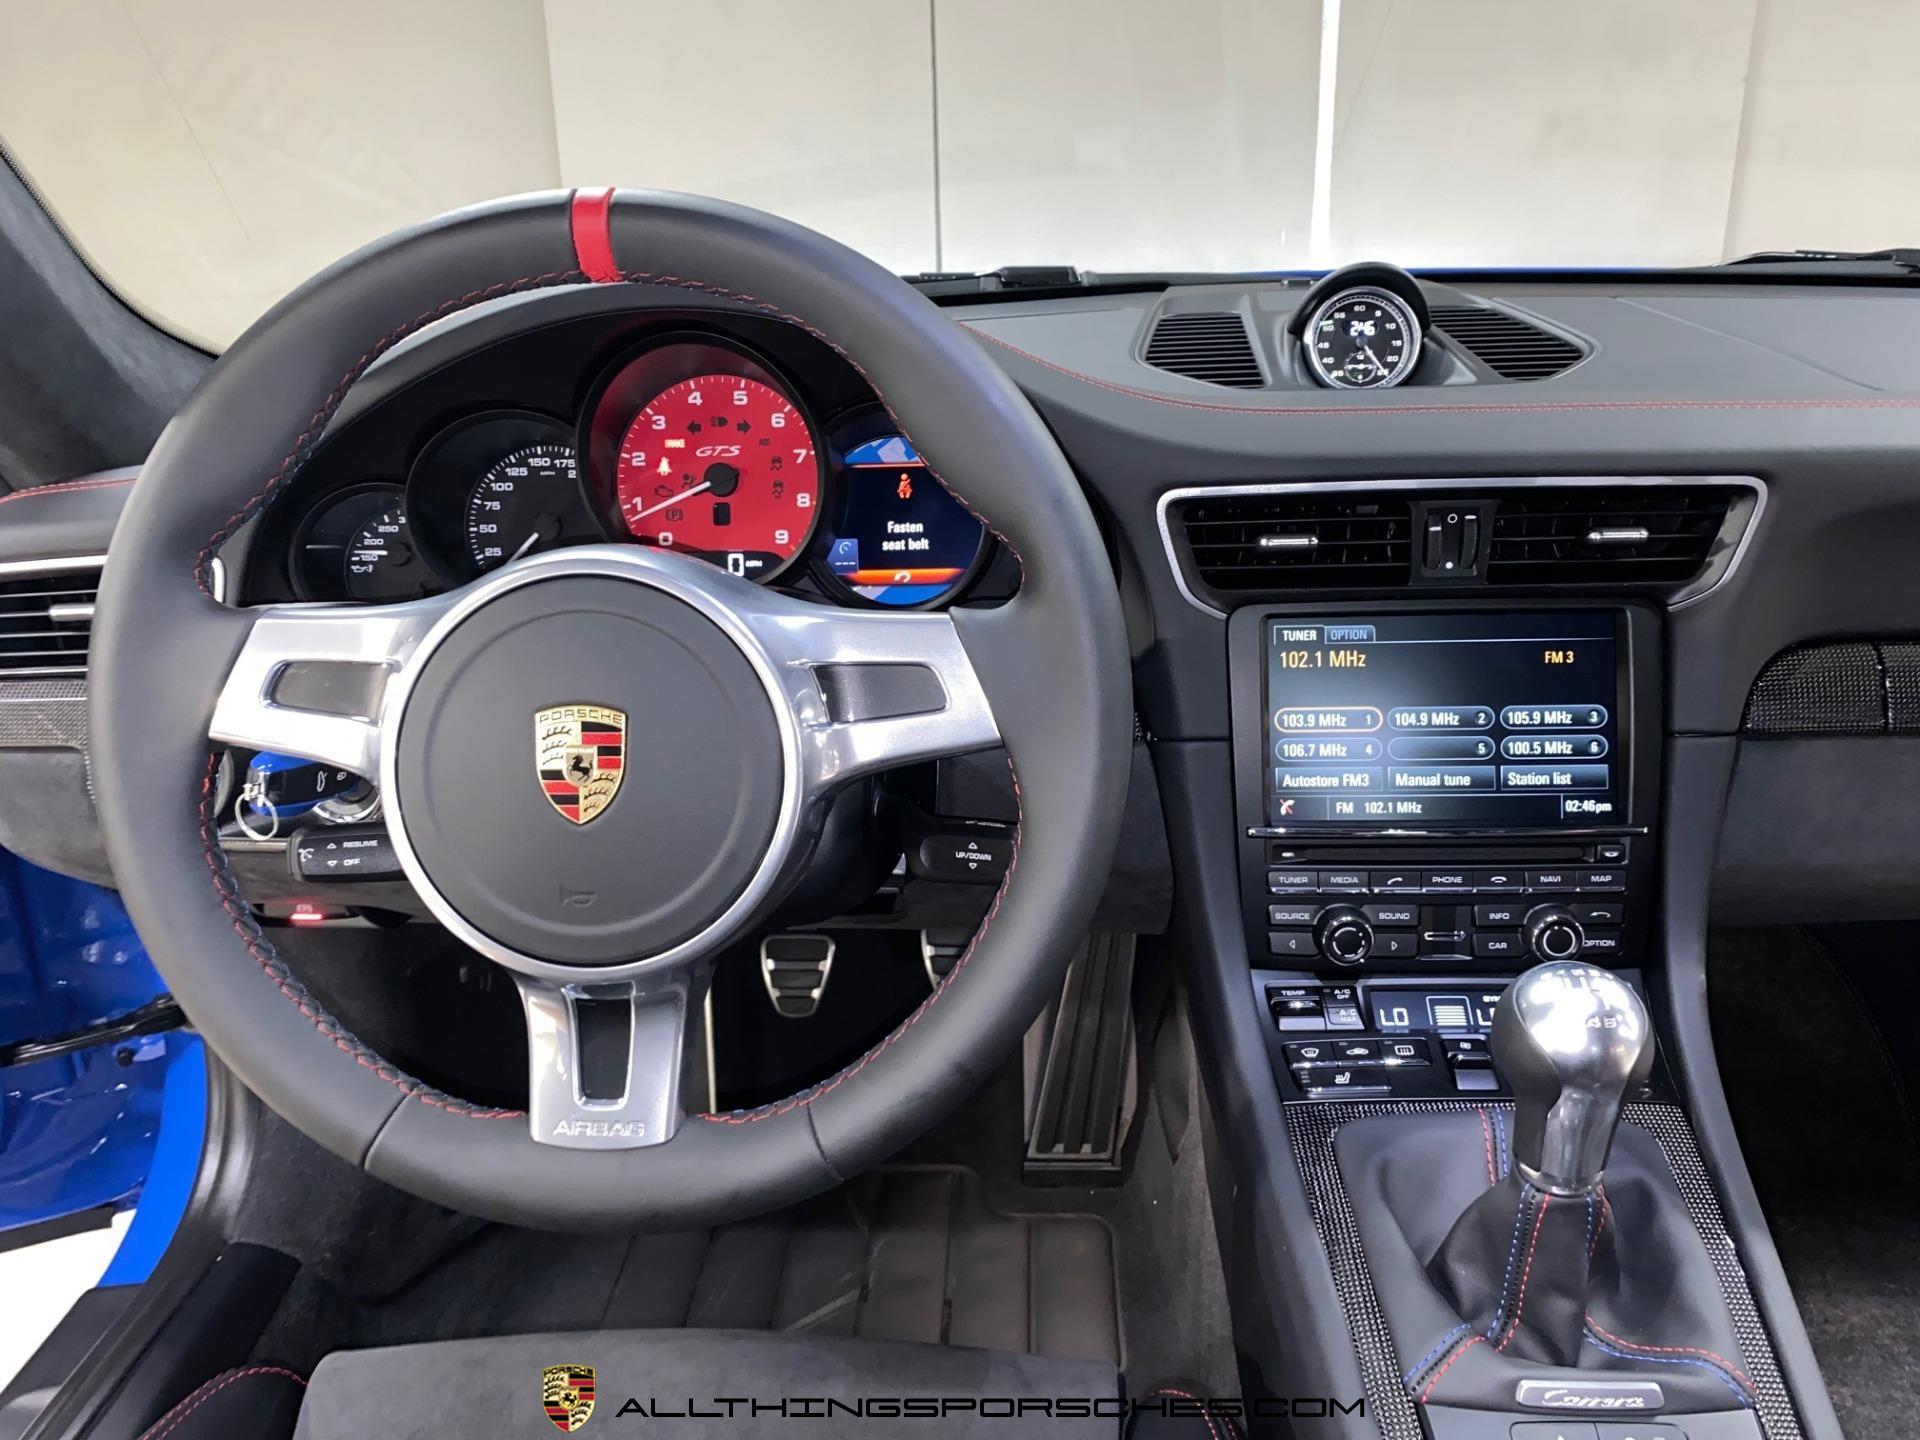 Used-2016-Porsche-911-Carrera-GTS-Club-Coupe-Manual-Trans